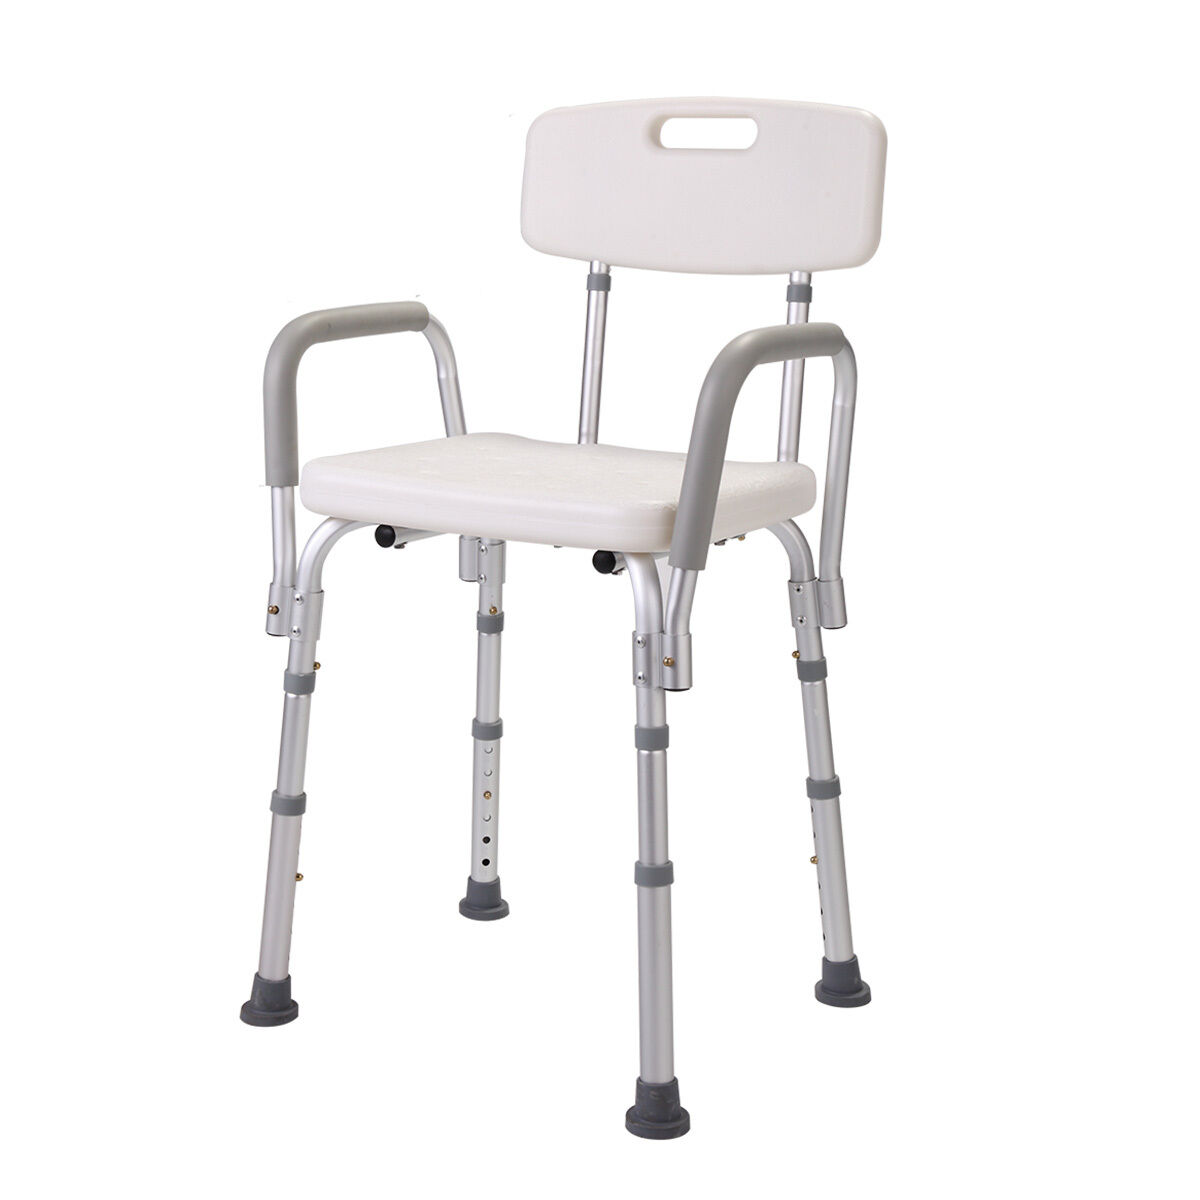 Height Adjustable Medical Shower Chair Bathtub Bench Bath Seat Stool ...